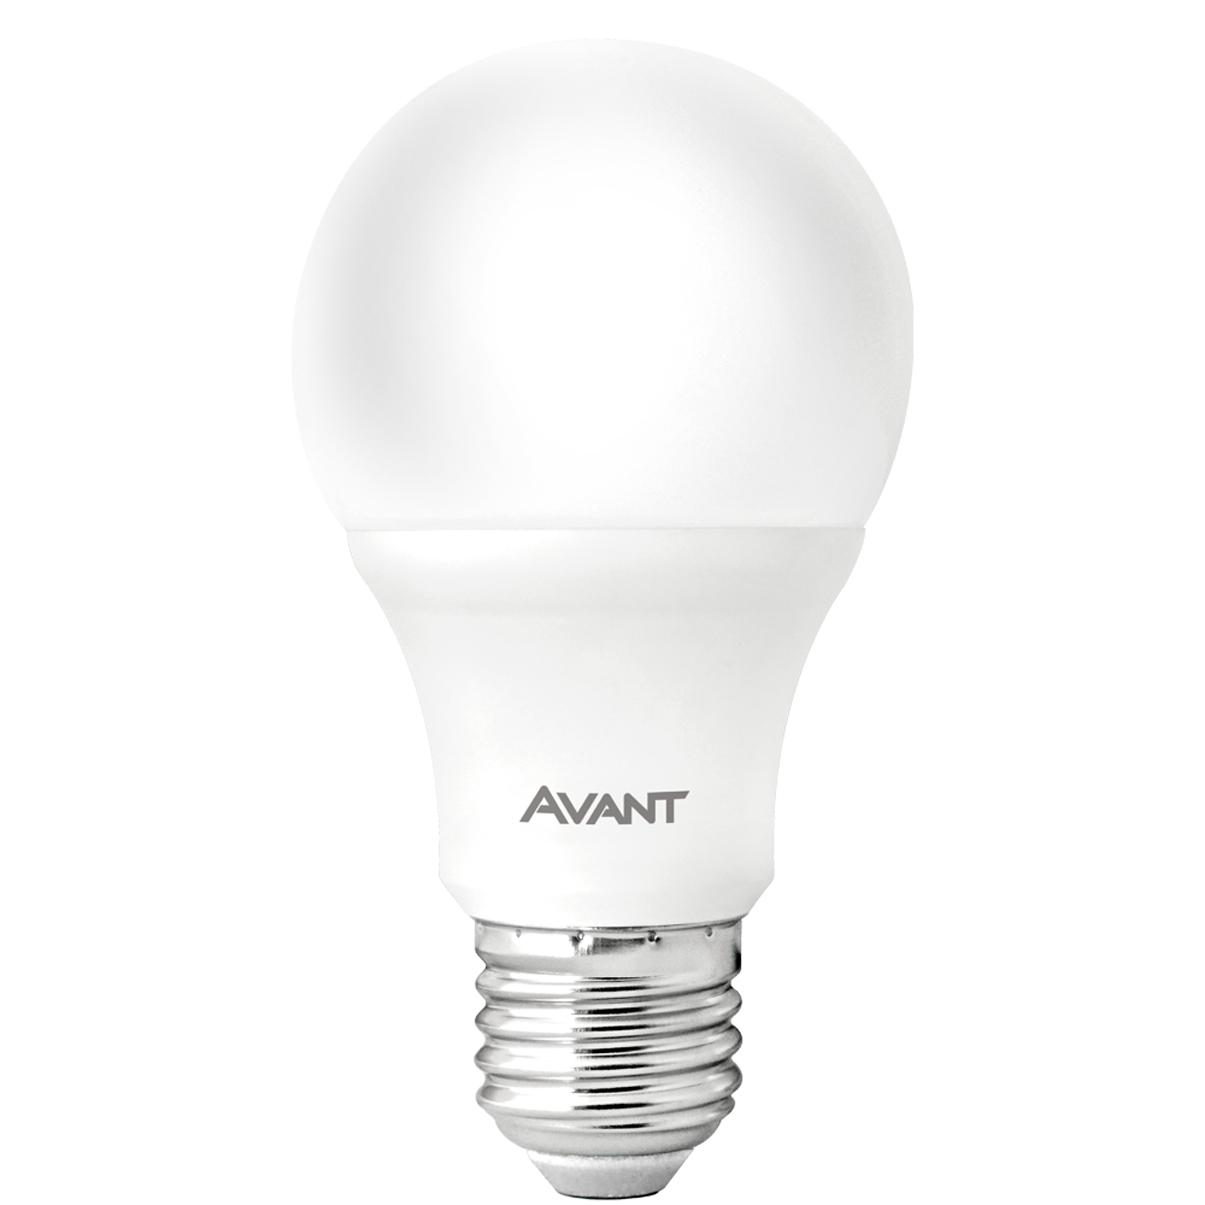 Lampada Bulbo 9w Branco Frio avant PACK 6 PECAS  - EMPORIO K